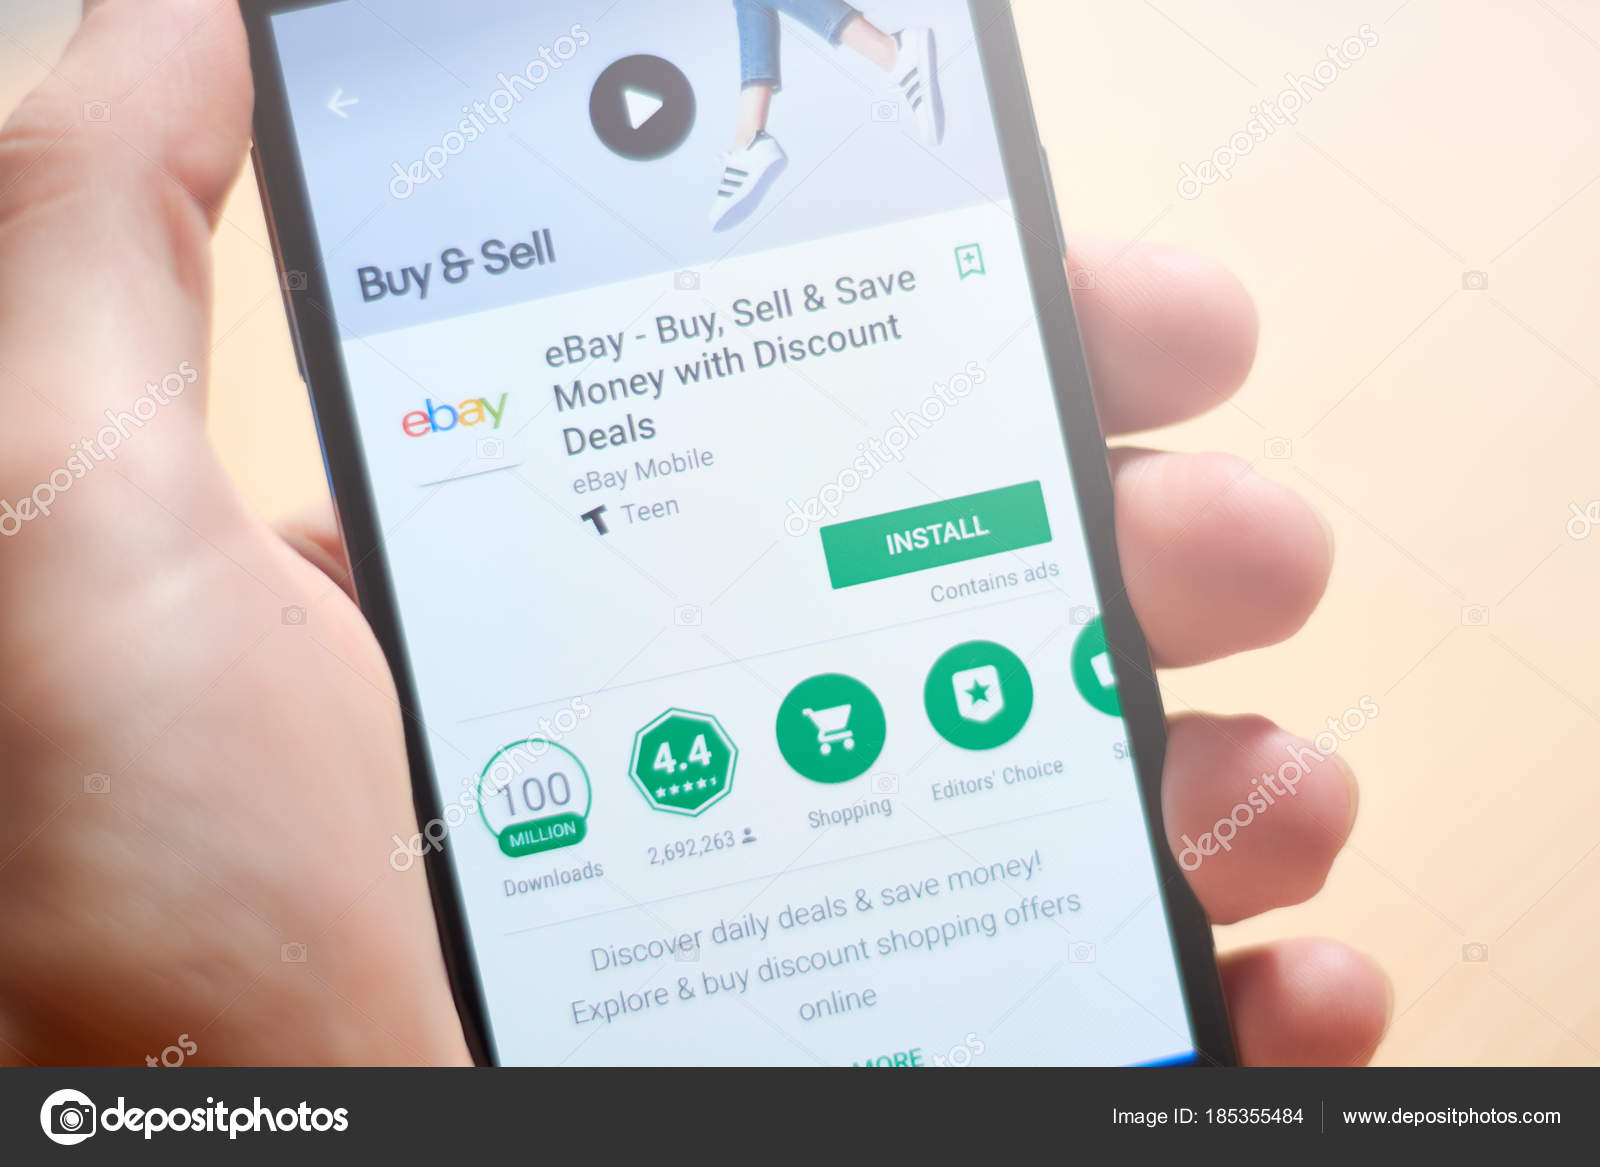 ebay download free app